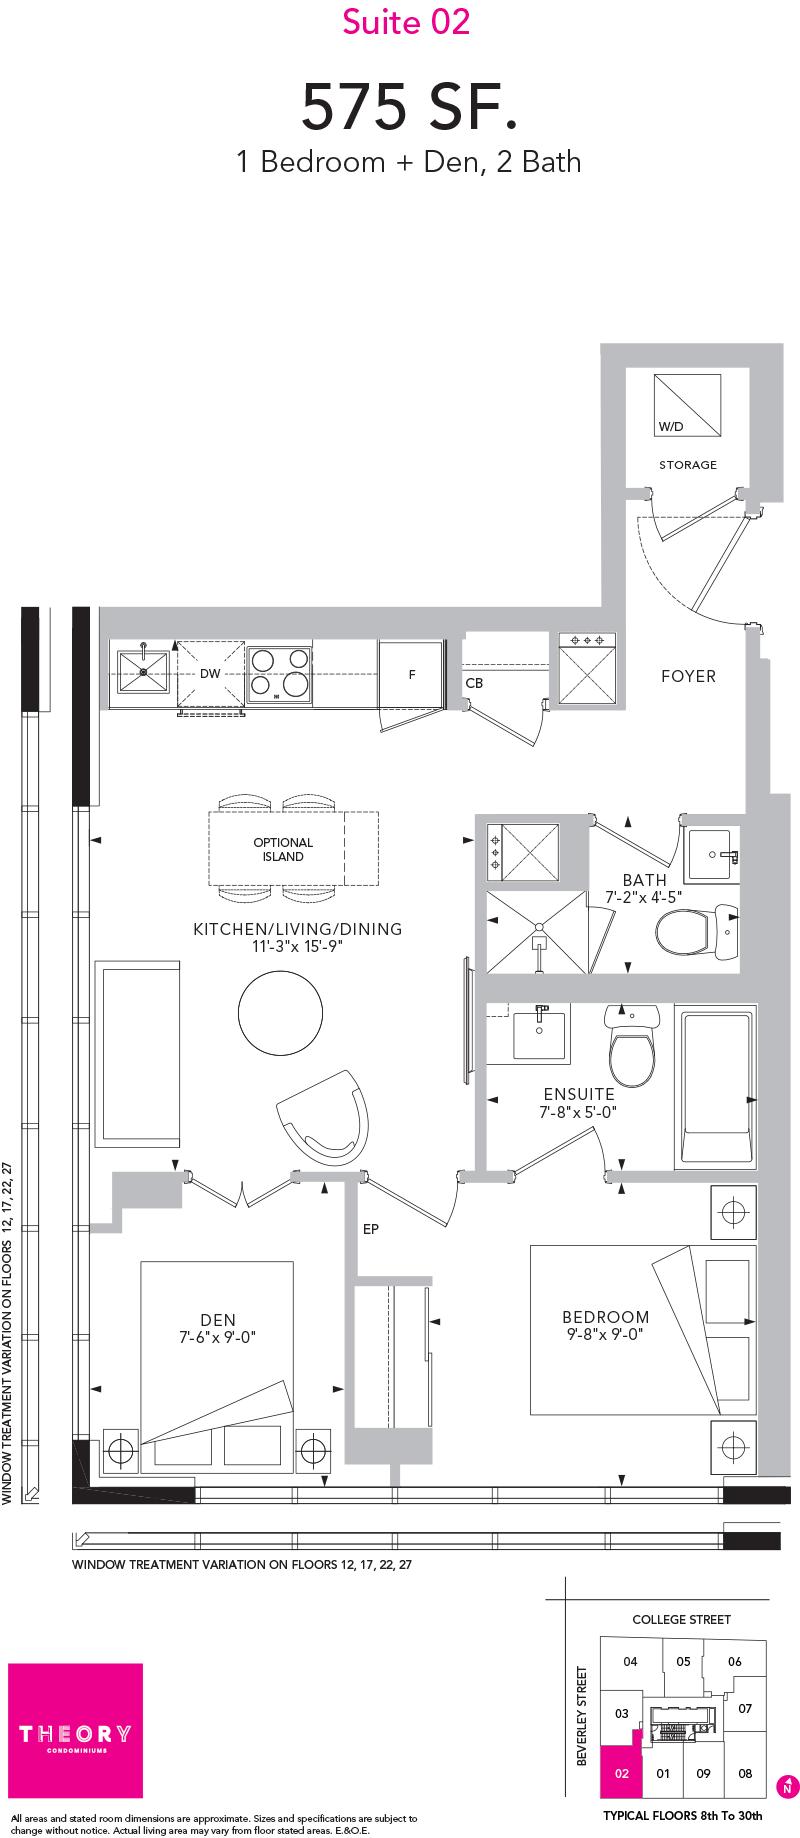 Theory Condos - Floorplan One + Den 575 sq ft